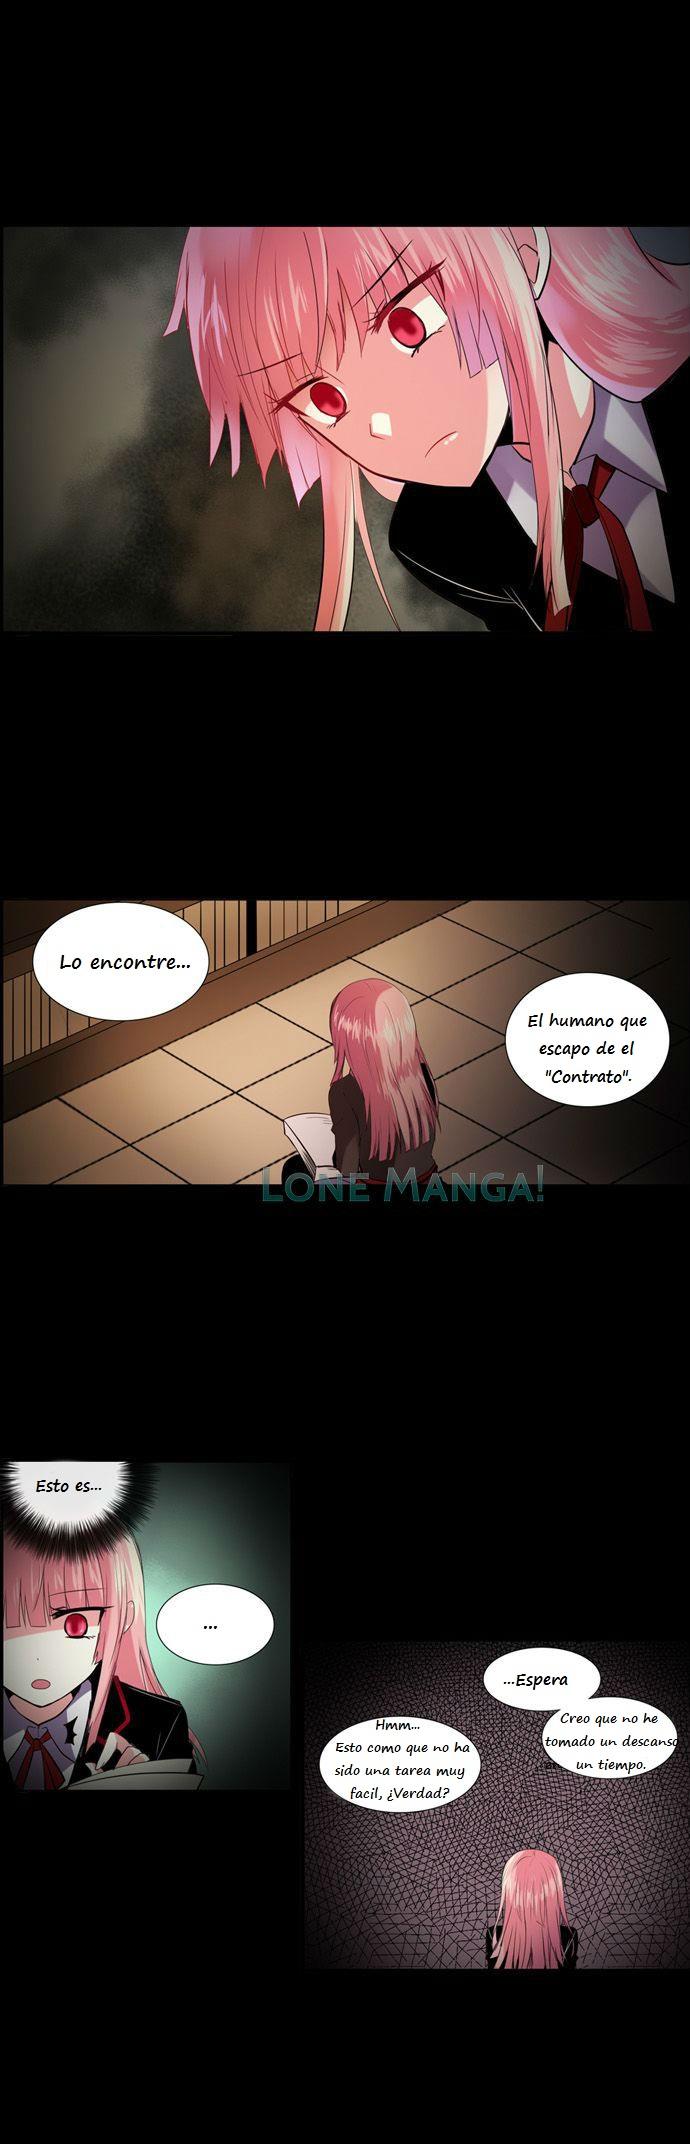 http://c5.ninemanga.com/es_manga/4/836/389096/ef2384c16b66734a8ccdff8d2015ea9b.jpg Page 2